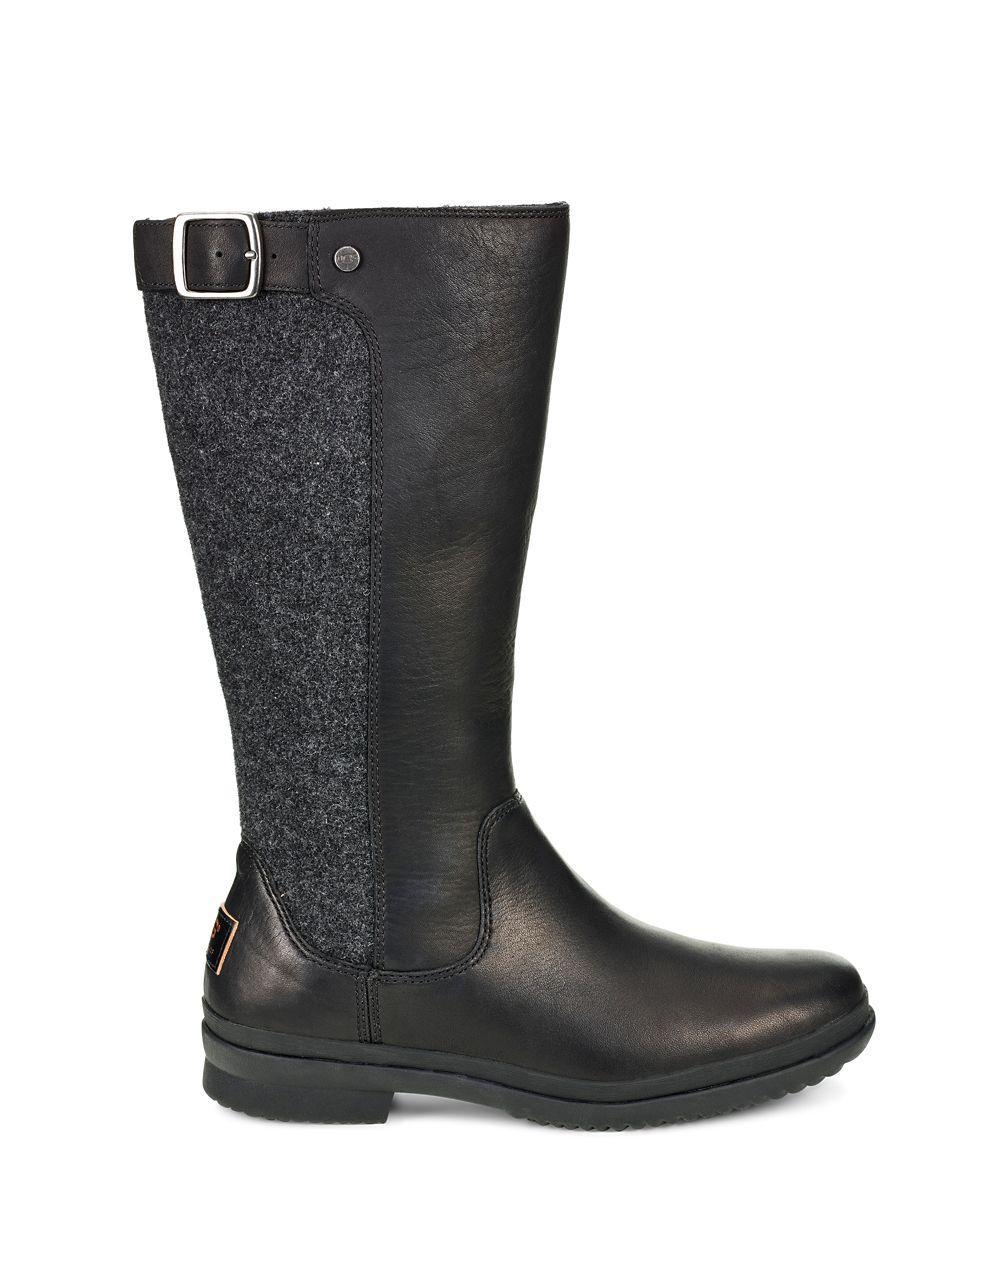 a3ed754cbbd Black Women's Janina Mid-calf Dyed Fur Boots